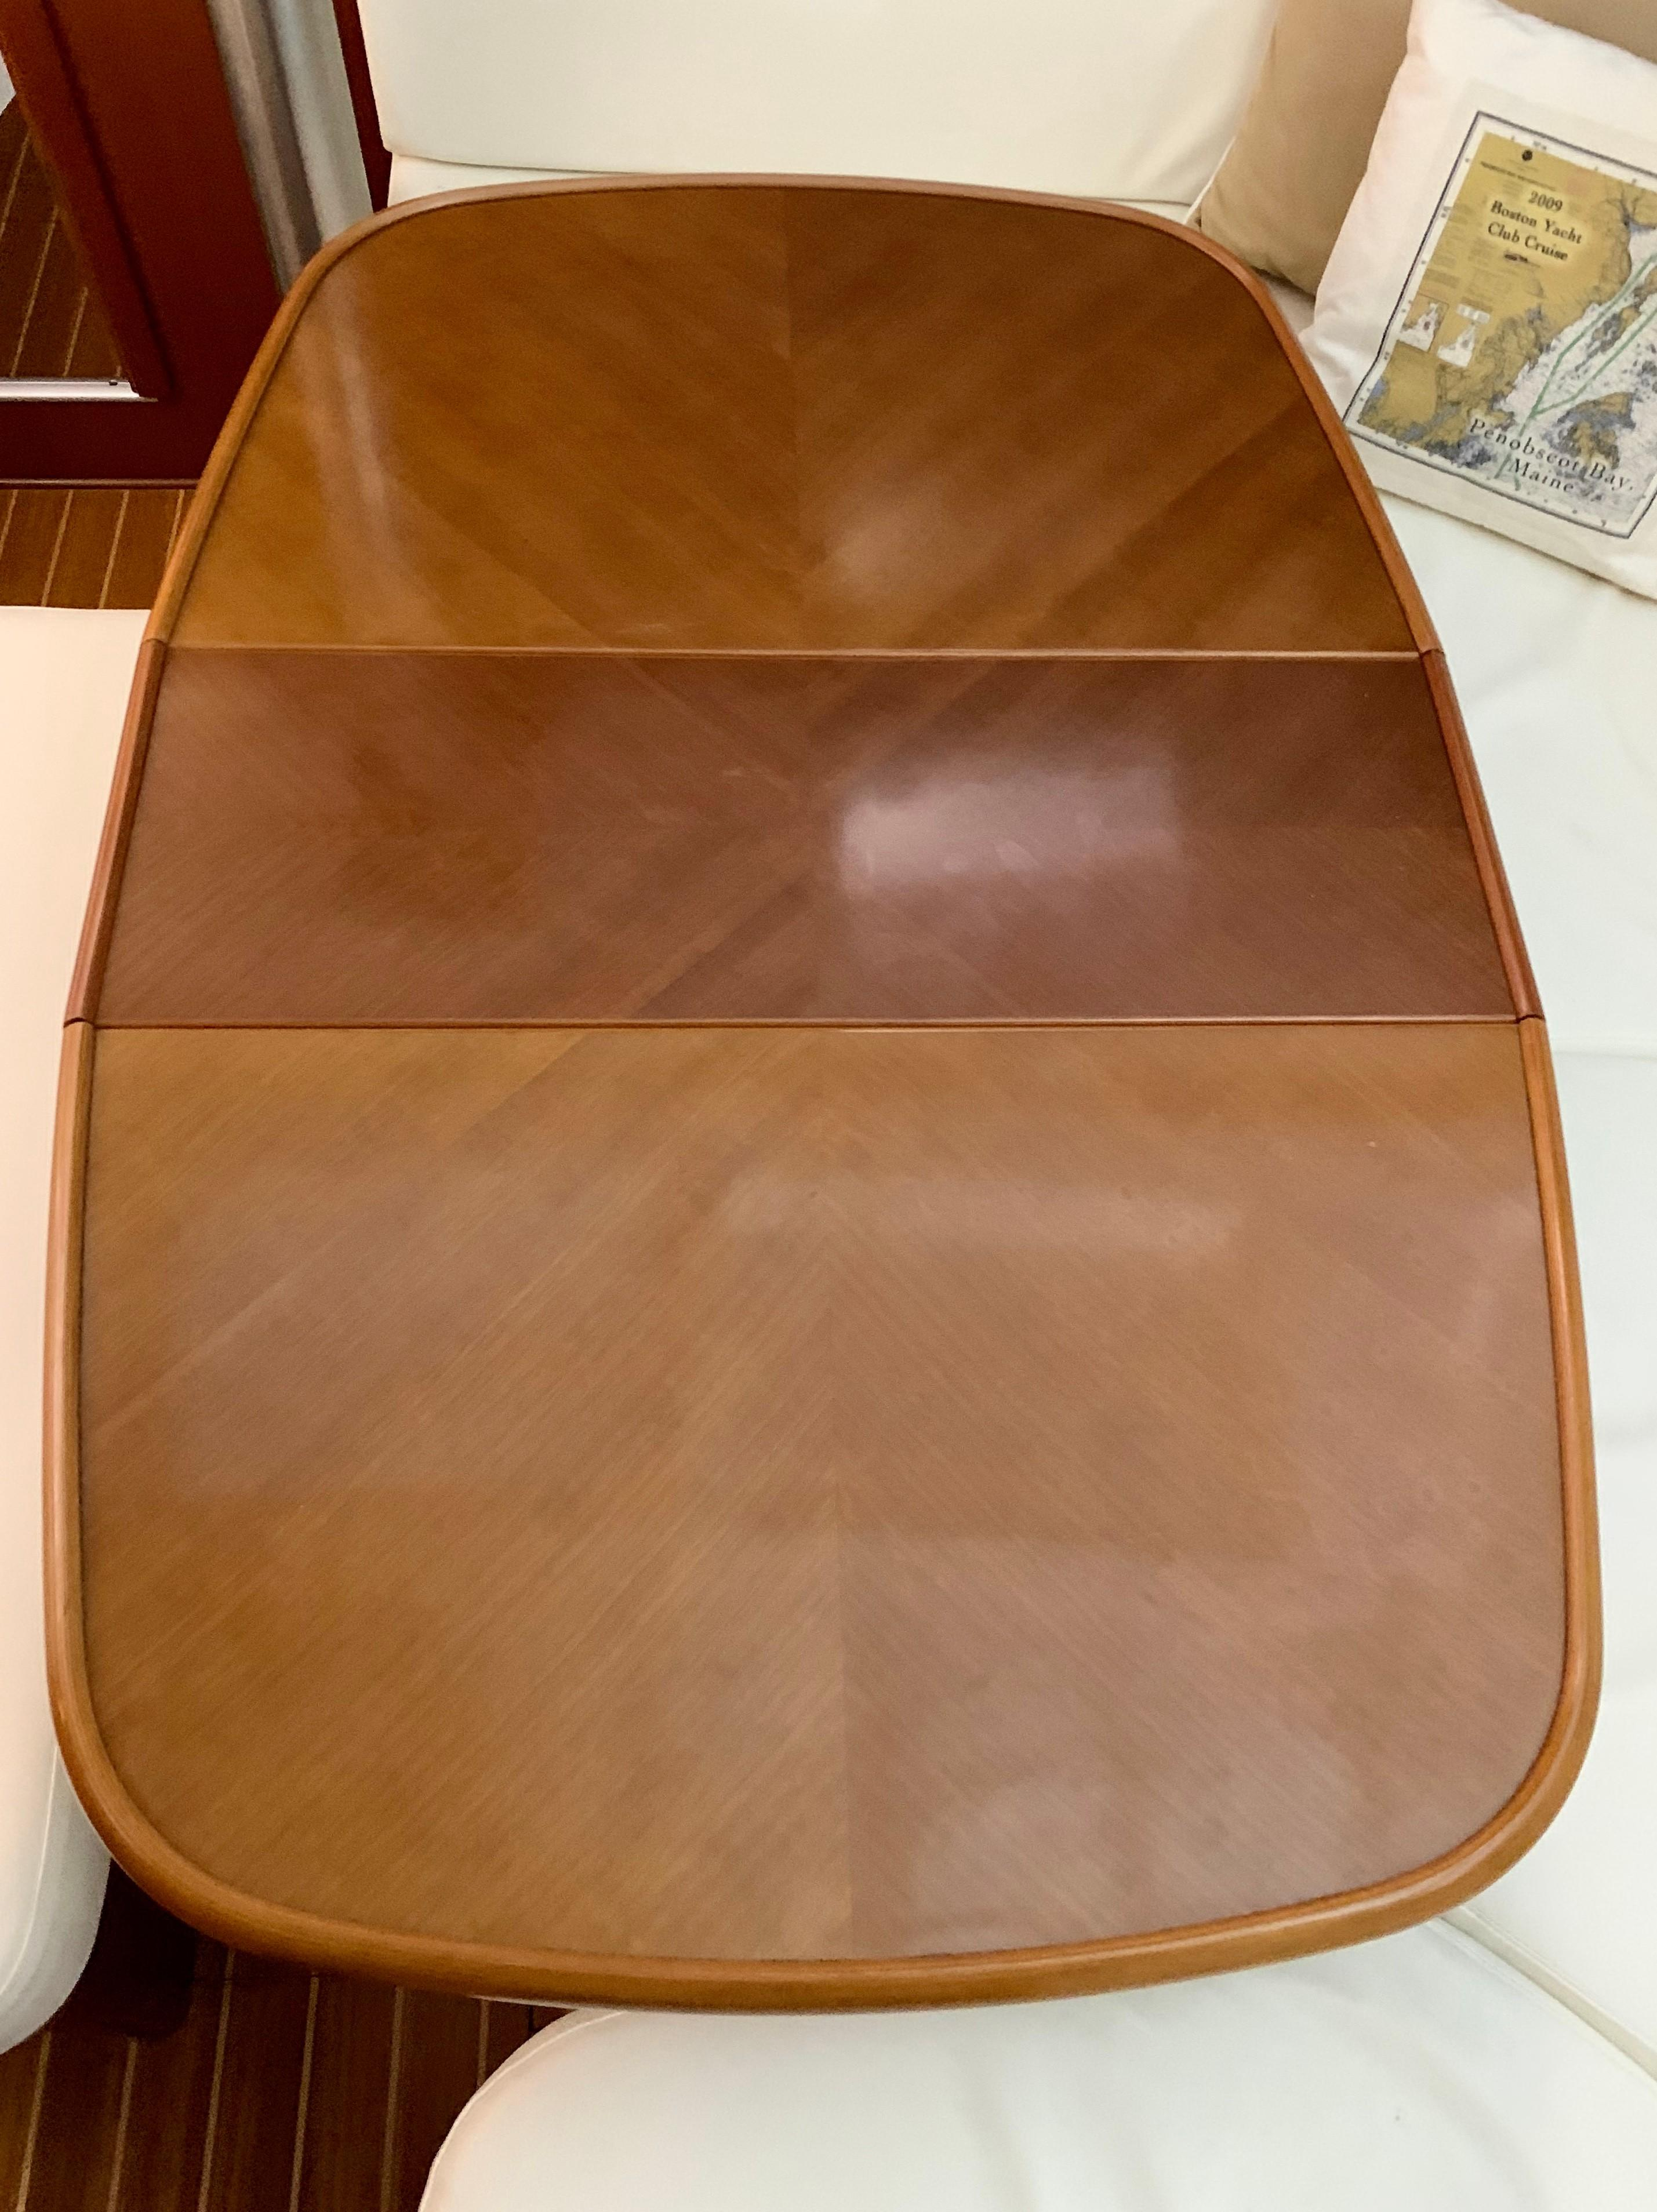 42 ft Beneteau 423 Salon table with leaf